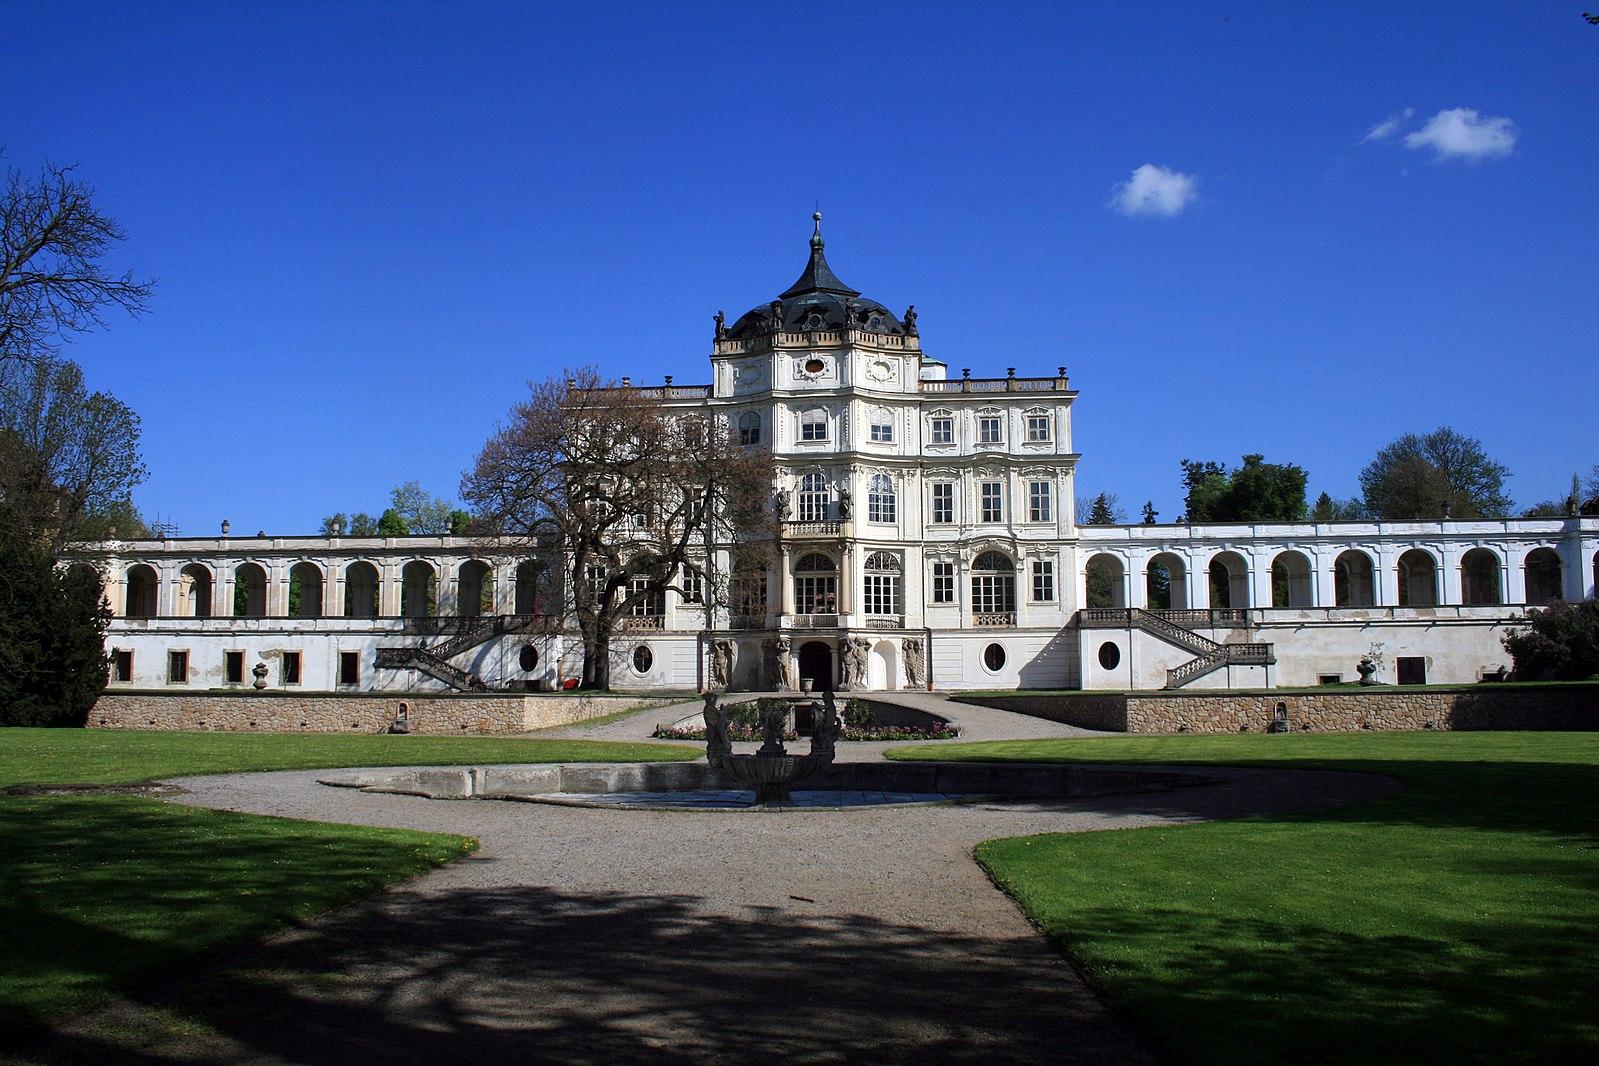 The palace of Ploskovice